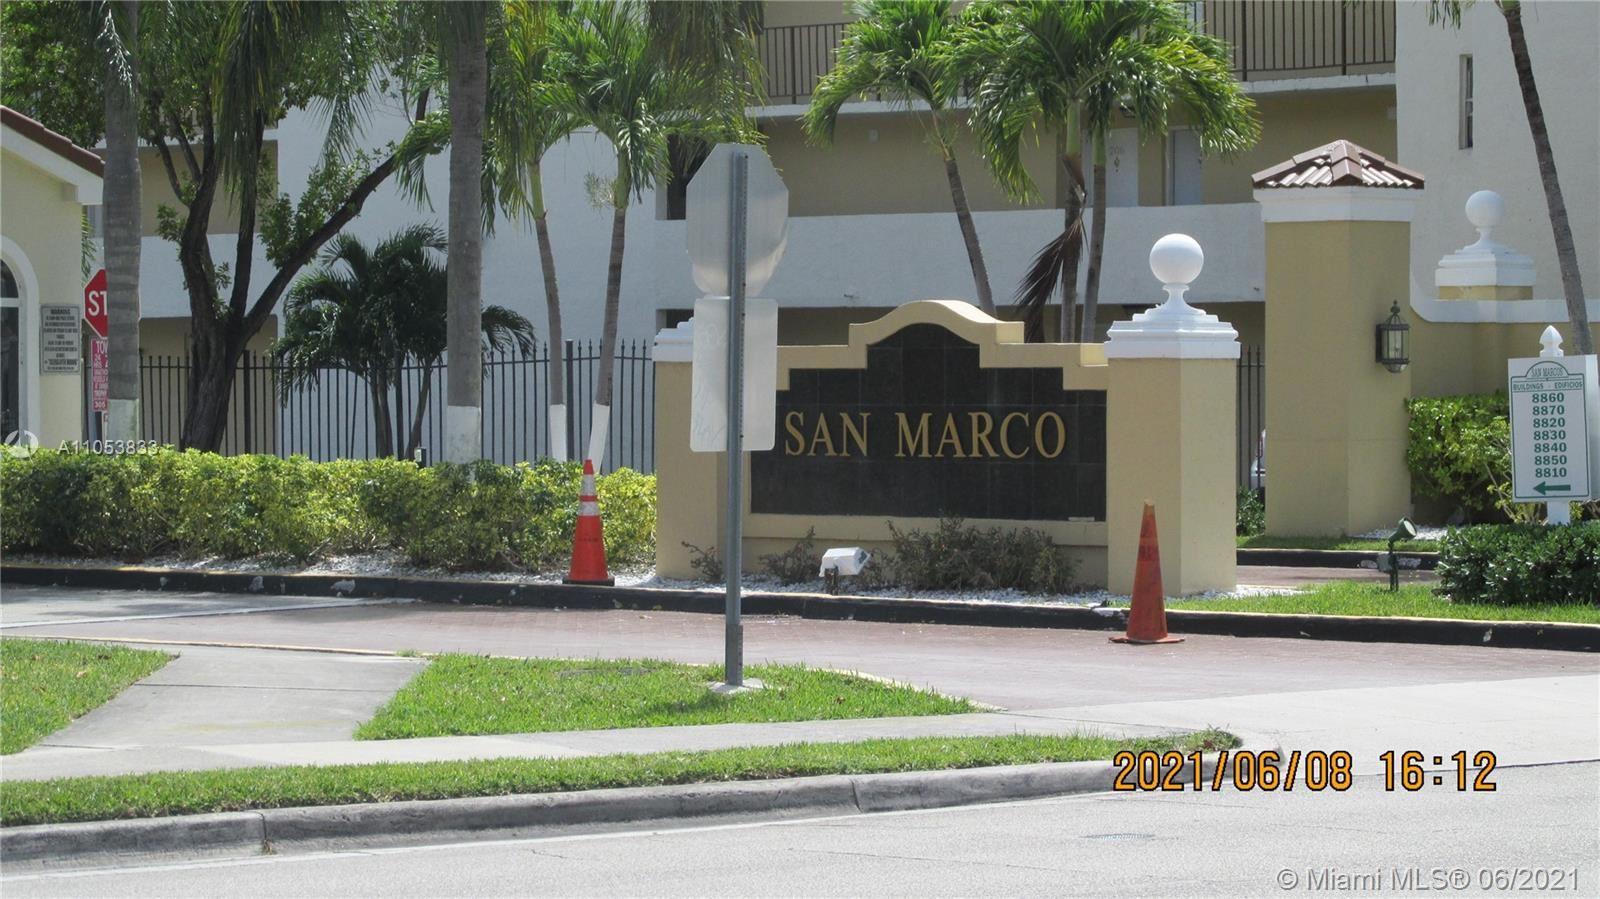 8810 Fontainebleau Blvd #210, Miami, FL 33172 - #: A11053833